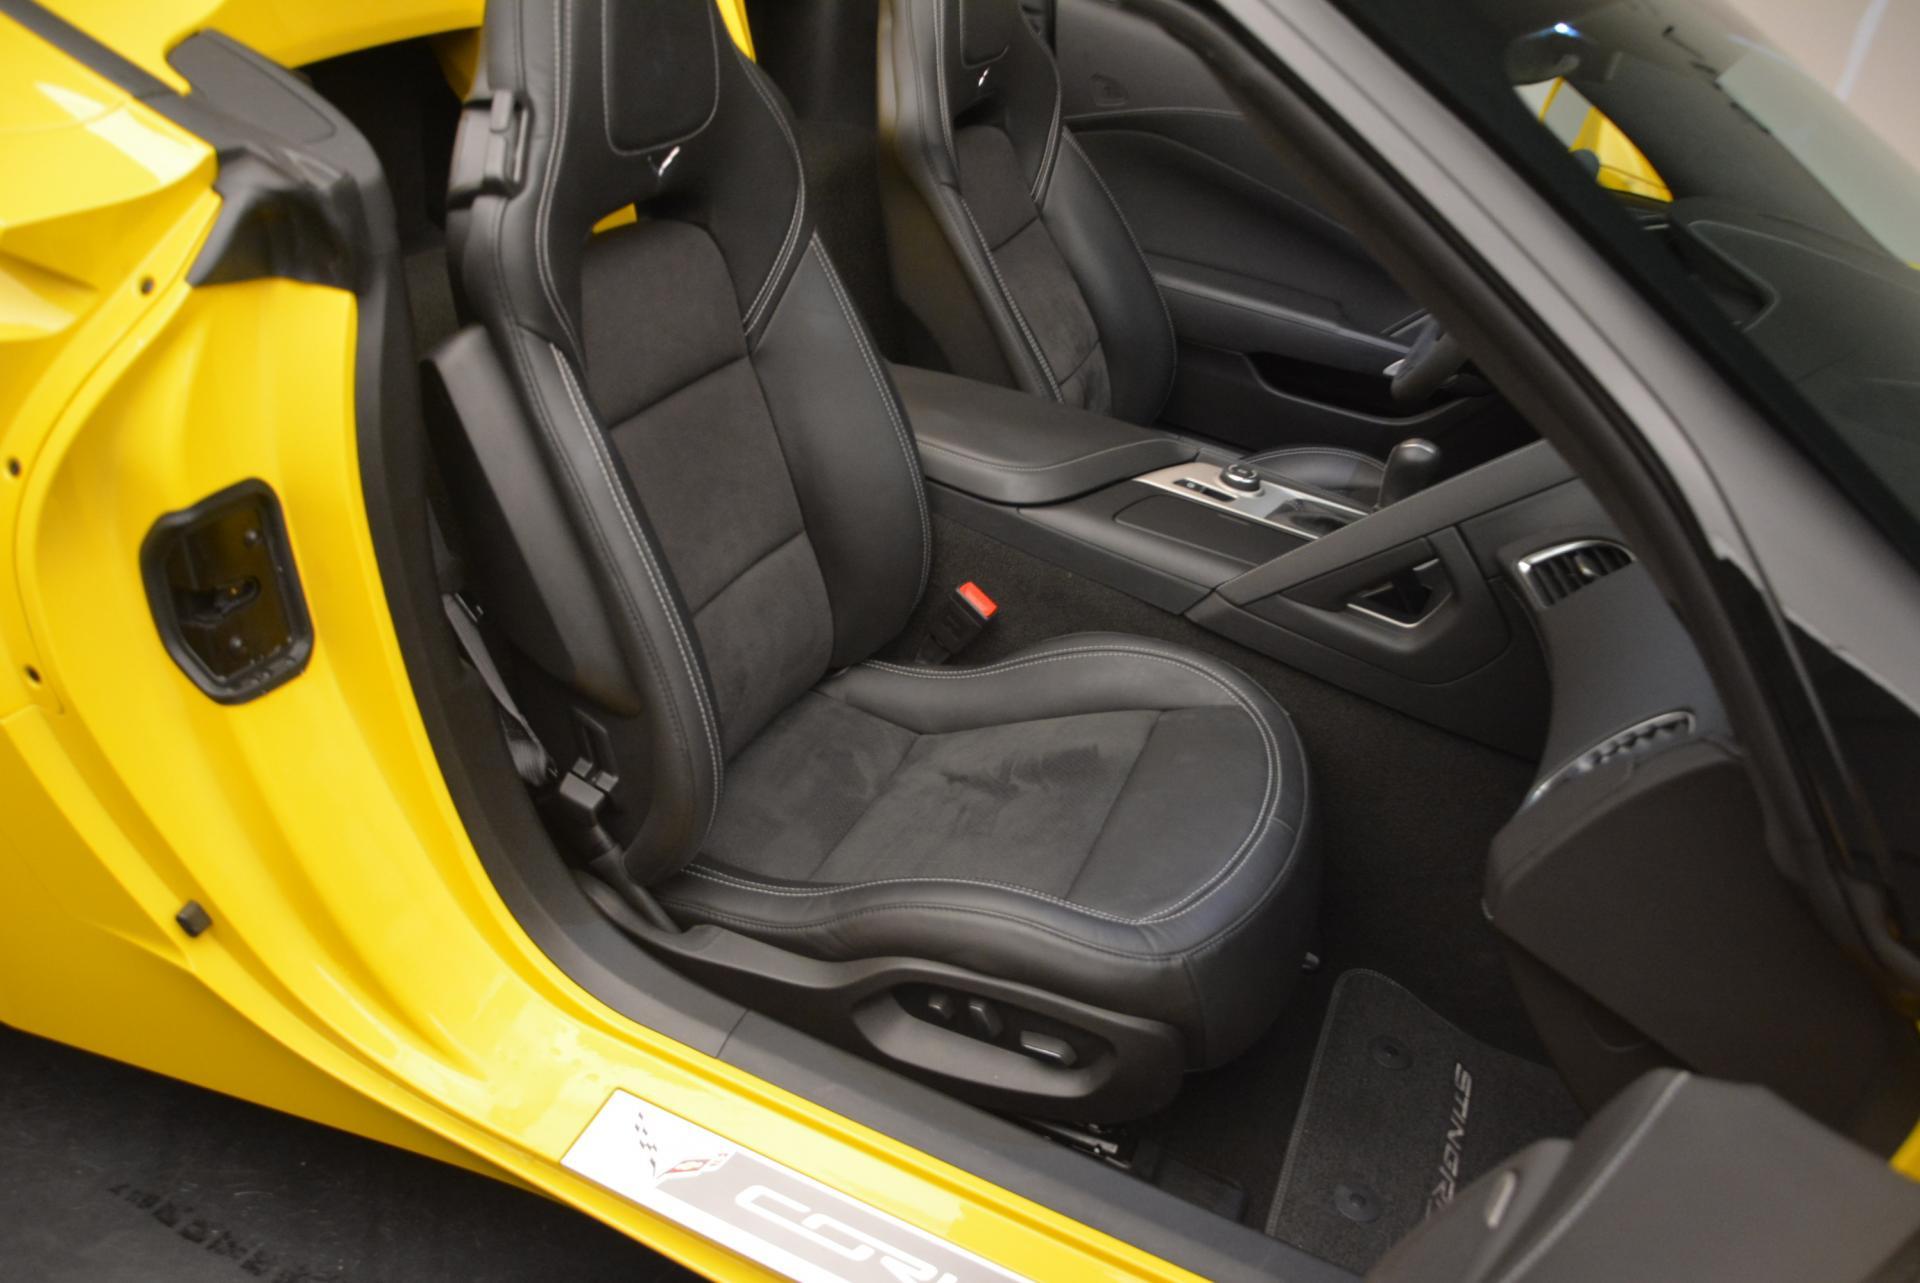 Used 2014 Chevrolet Corvette Stingray Z51 For Sale In Greenwich, CT 523_p20